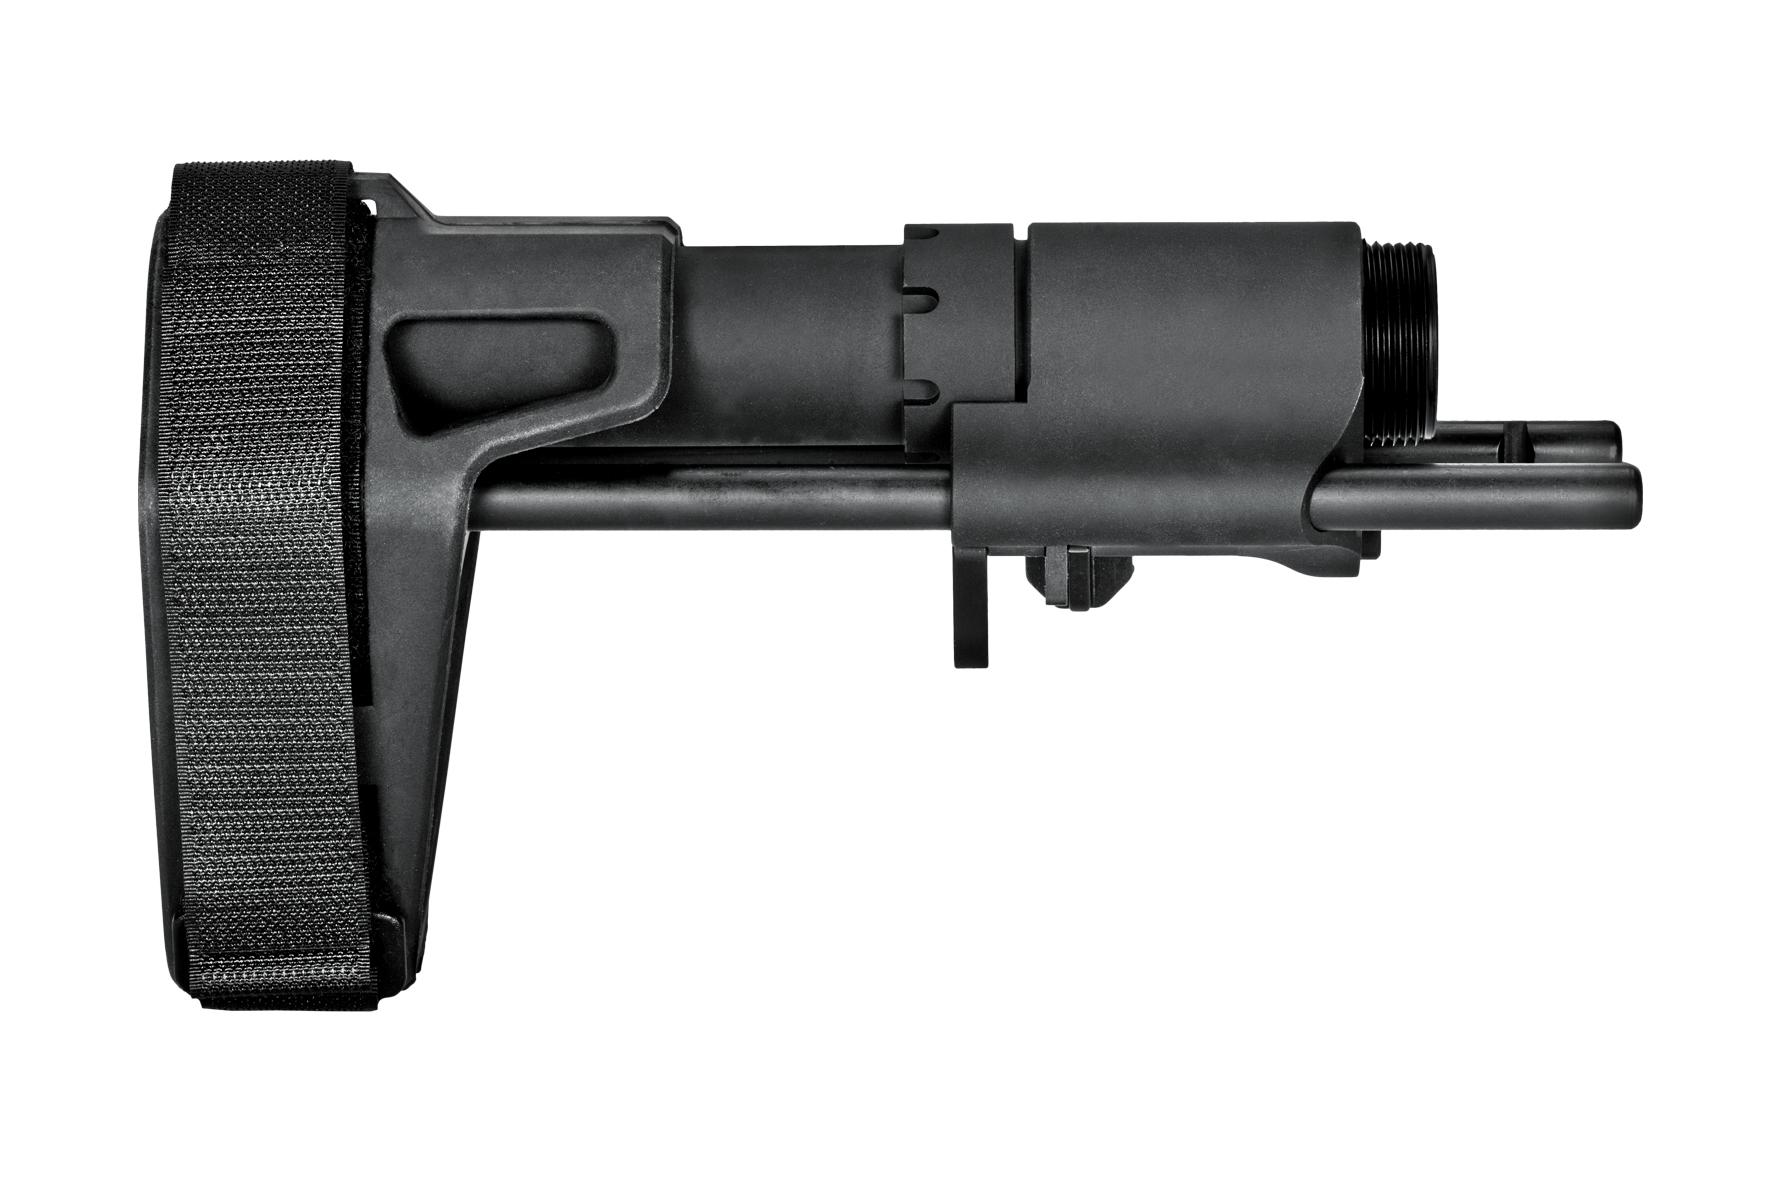 SB Tactical SBPDW Adjustable Pistol Stabilizing Brace